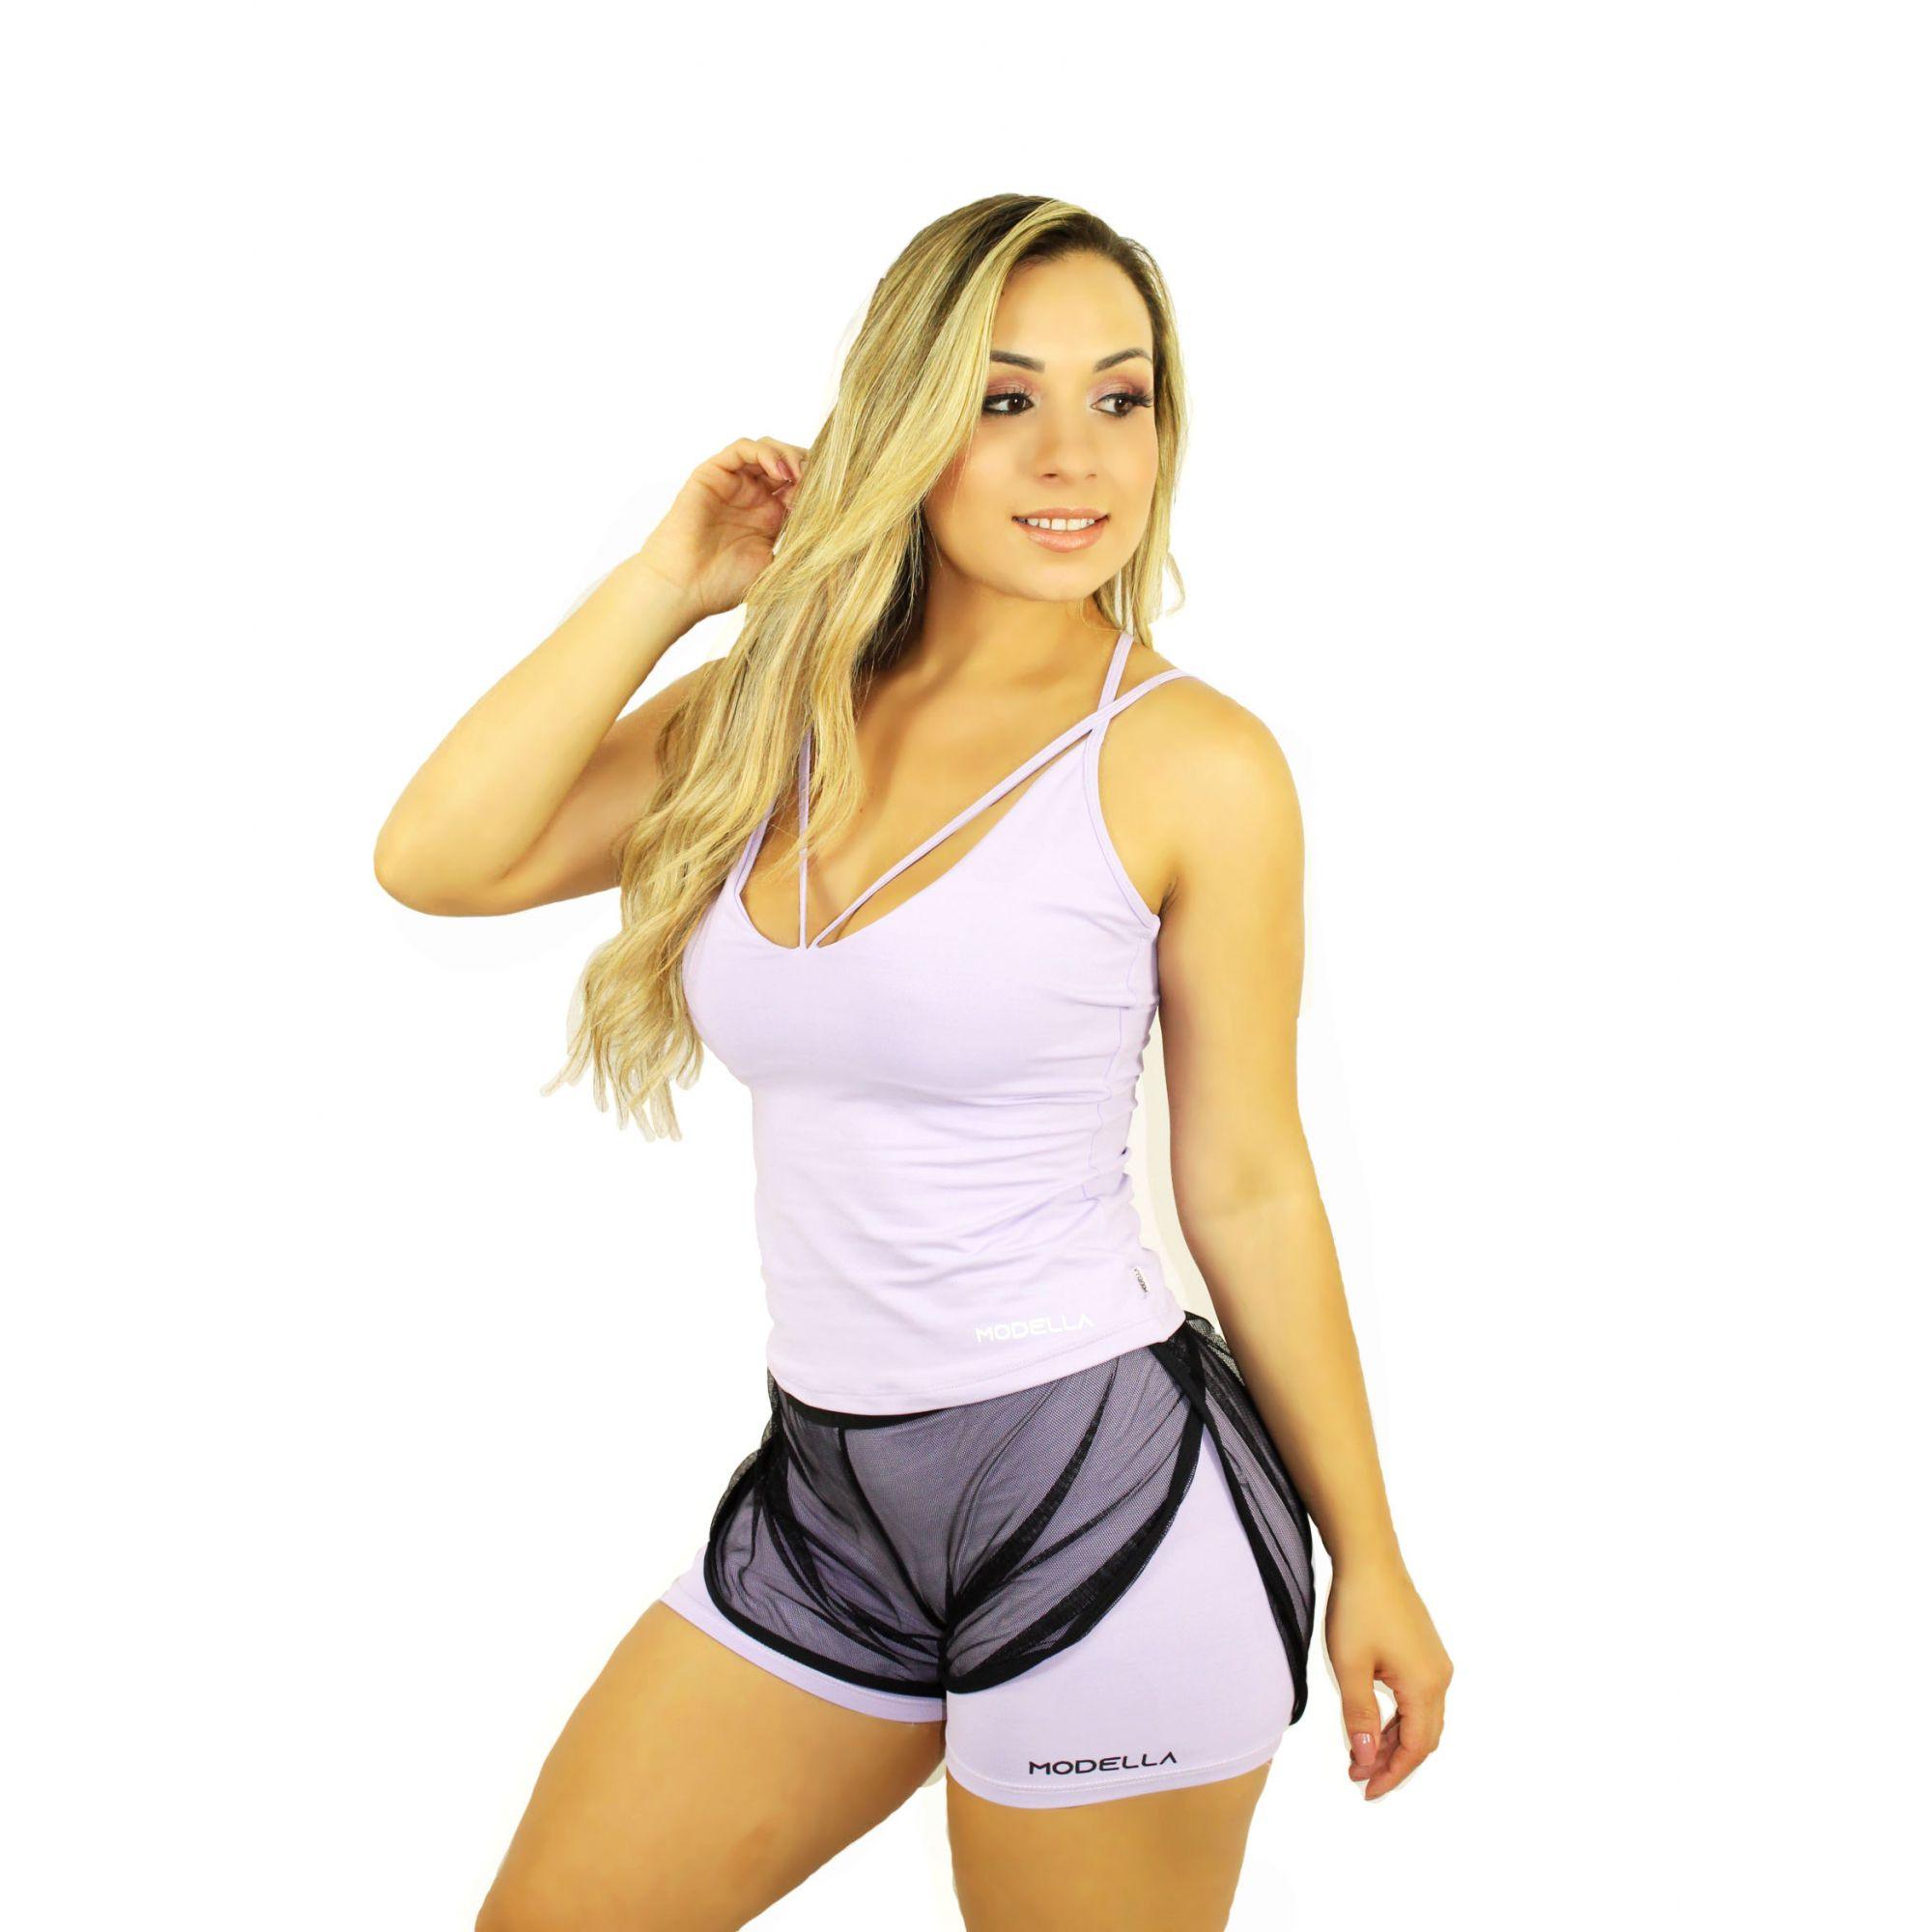 Shorts Light Collor